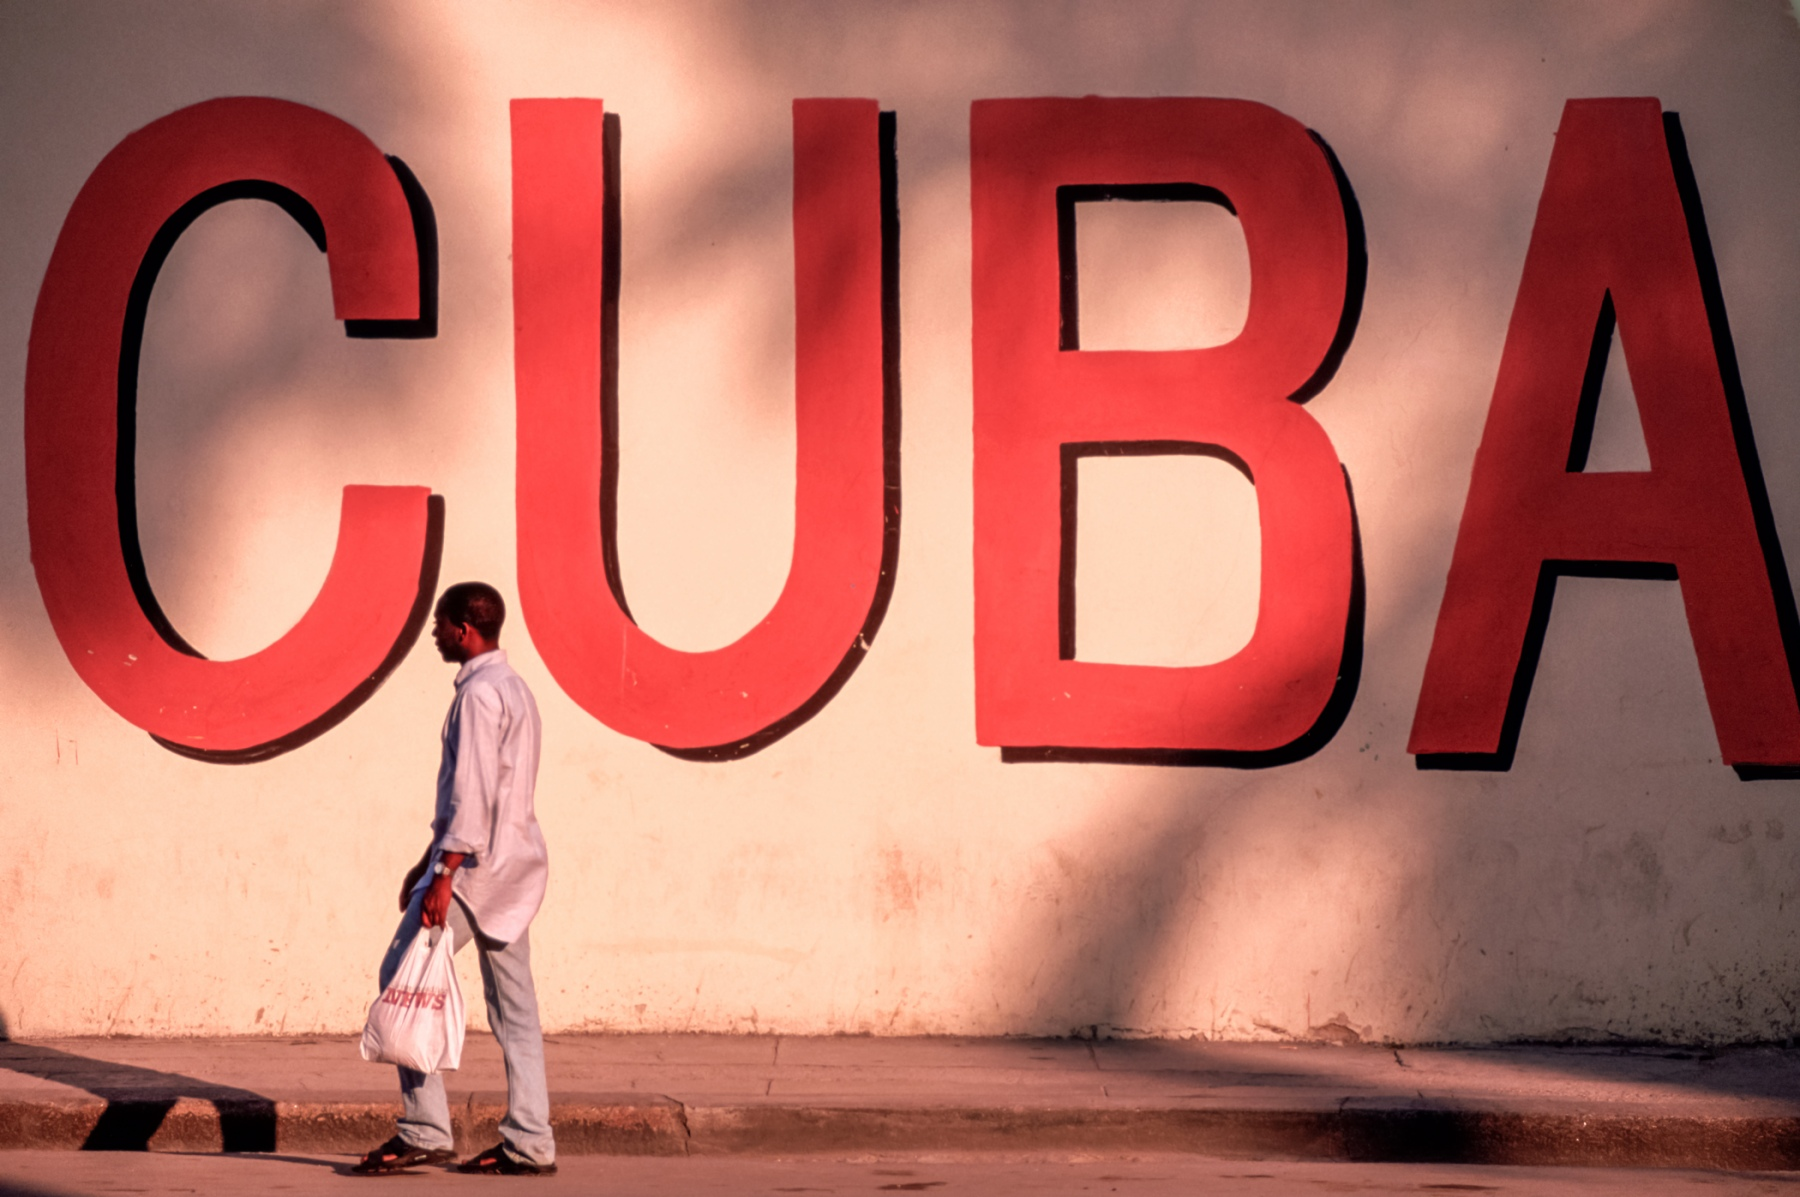 Cub038.StreetScenesWEB